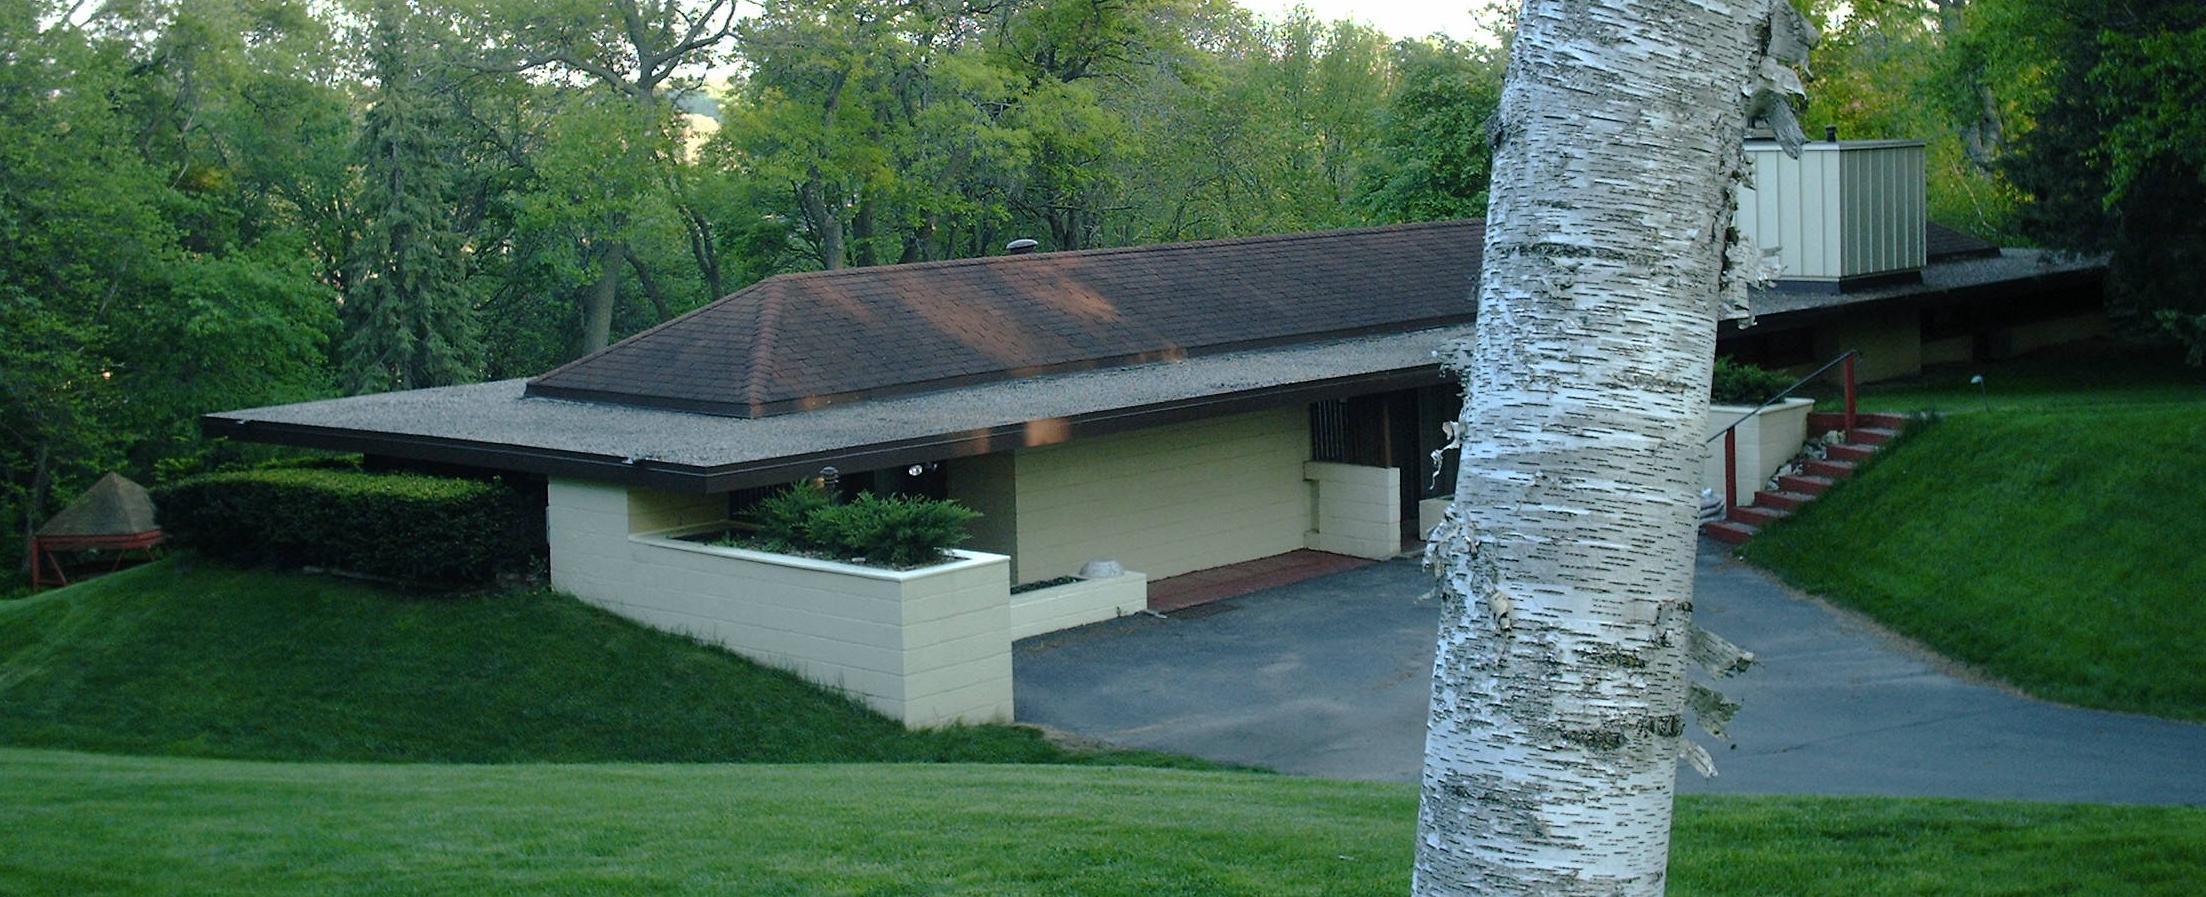 Рис.1. Дом Томаса Киса (Thomas Keys House), Рочестер (Миннесота), 1950